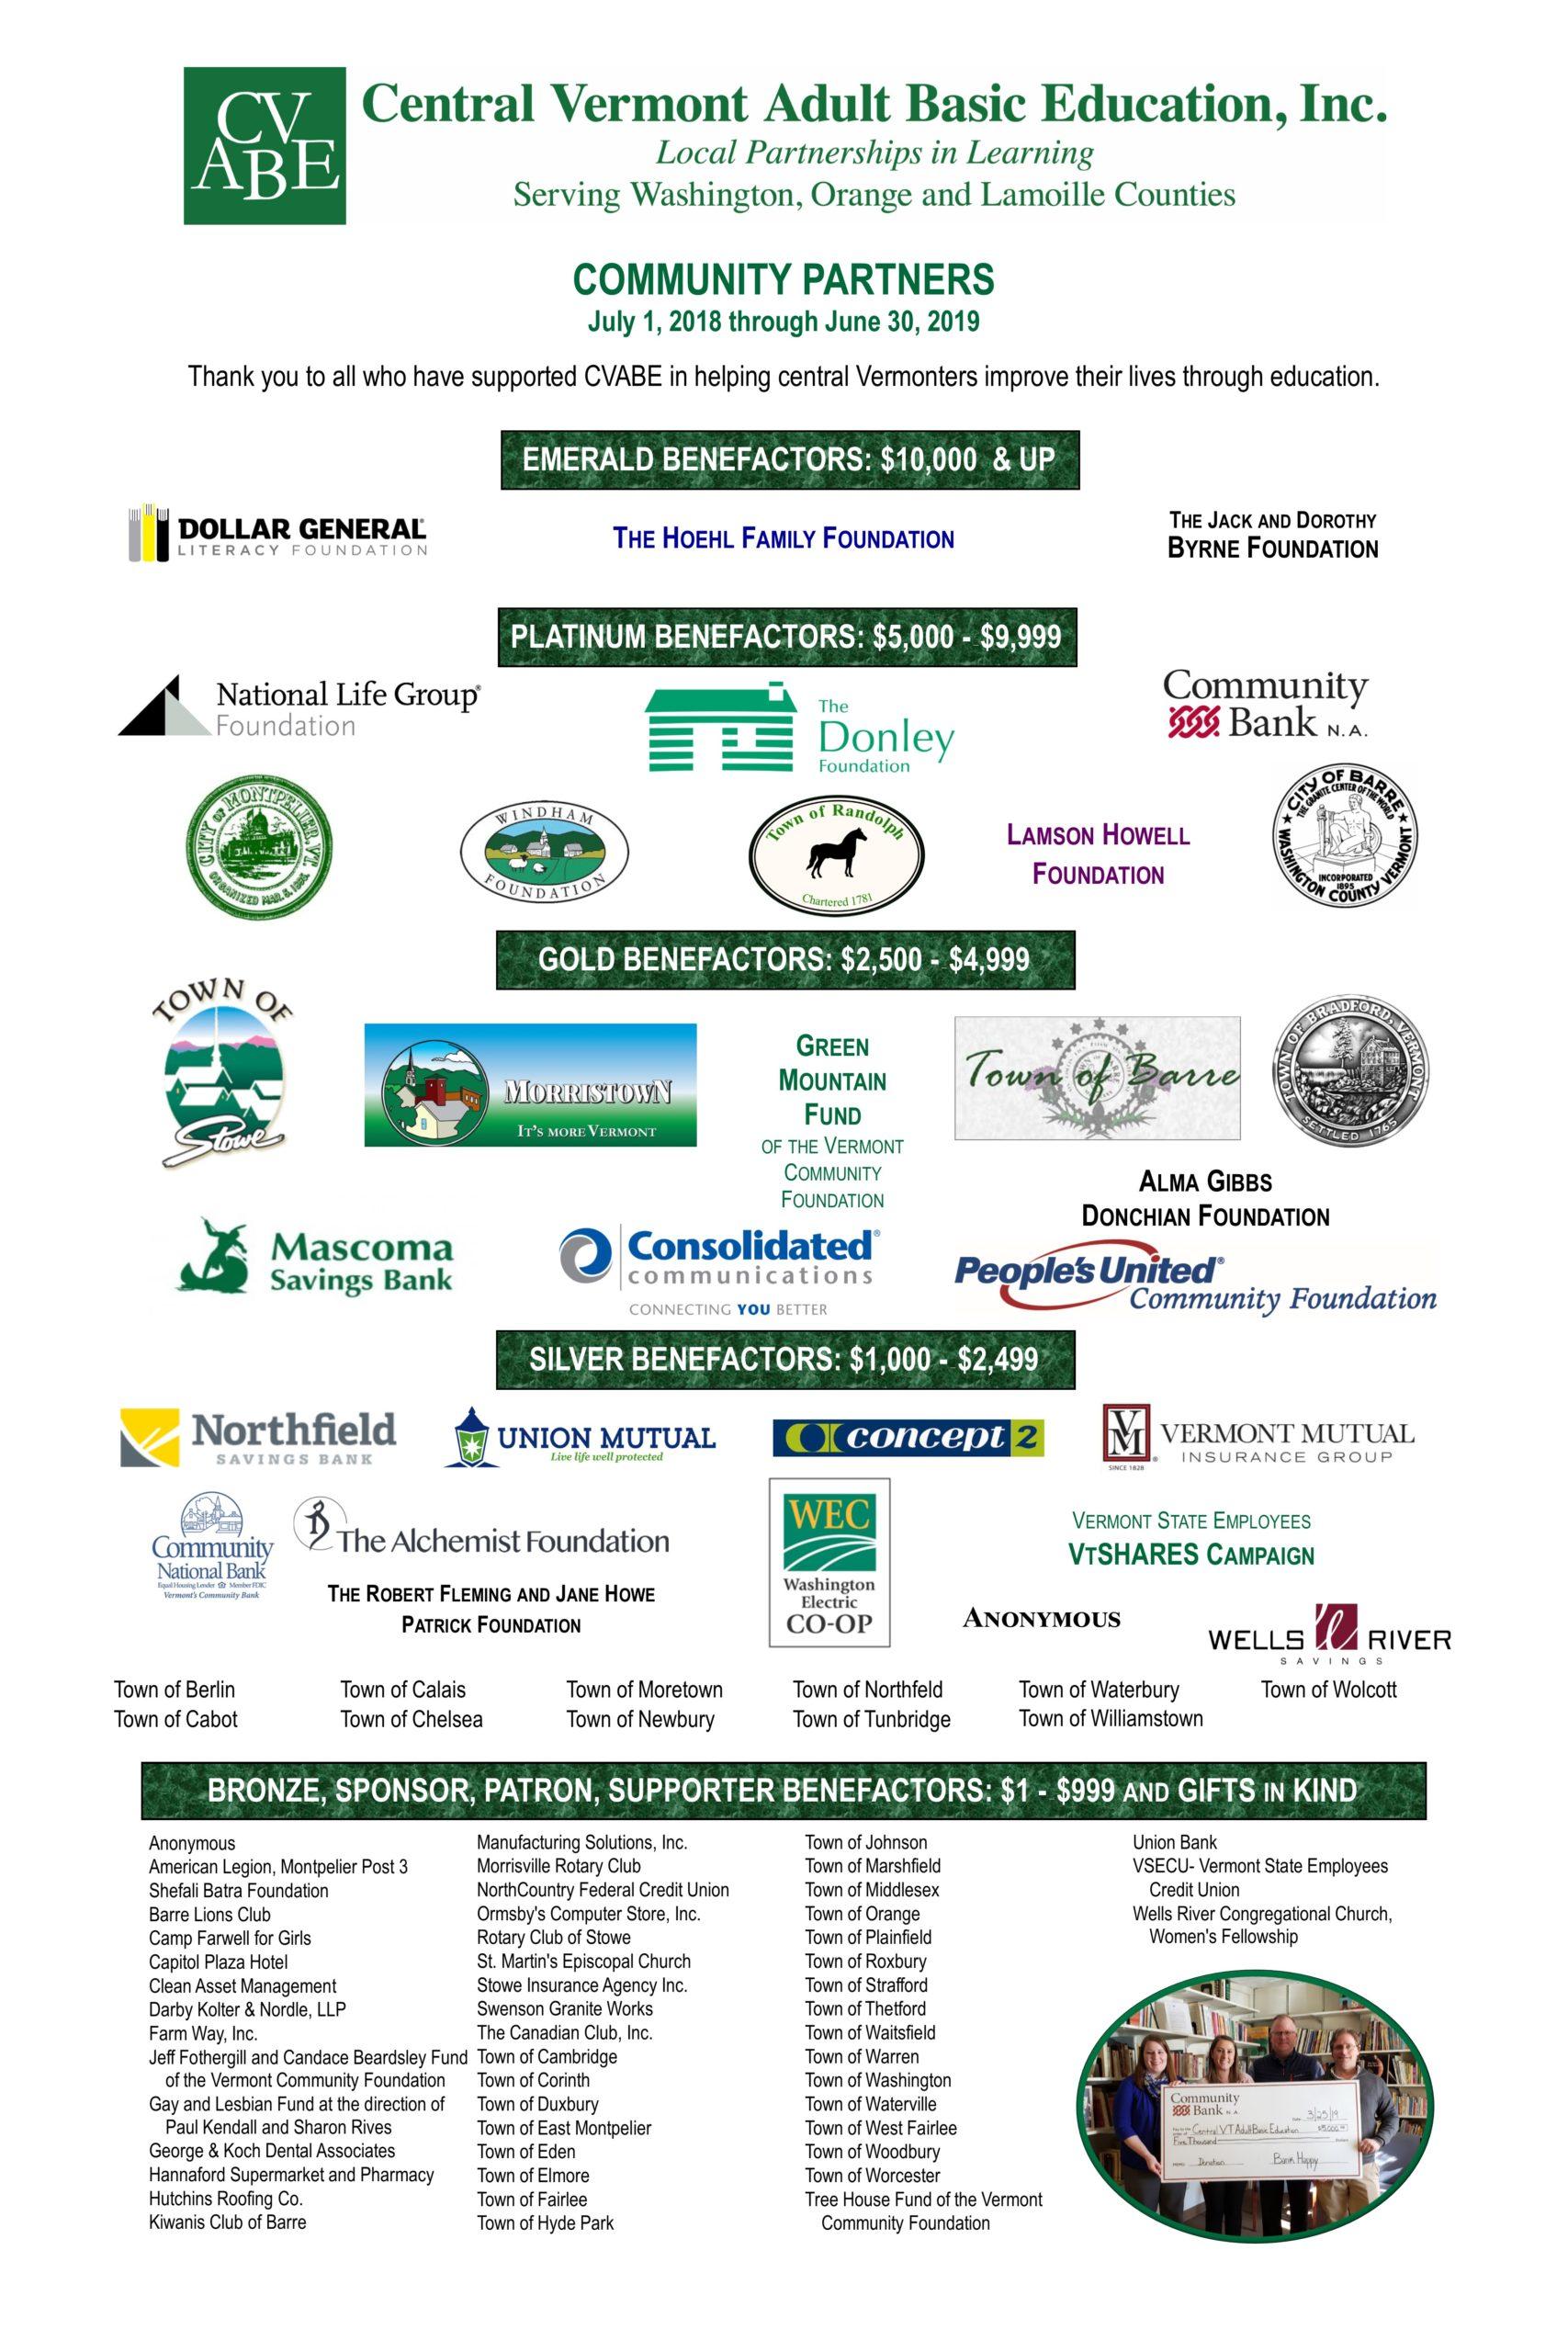 Community Partners 2018-19 8.21.20